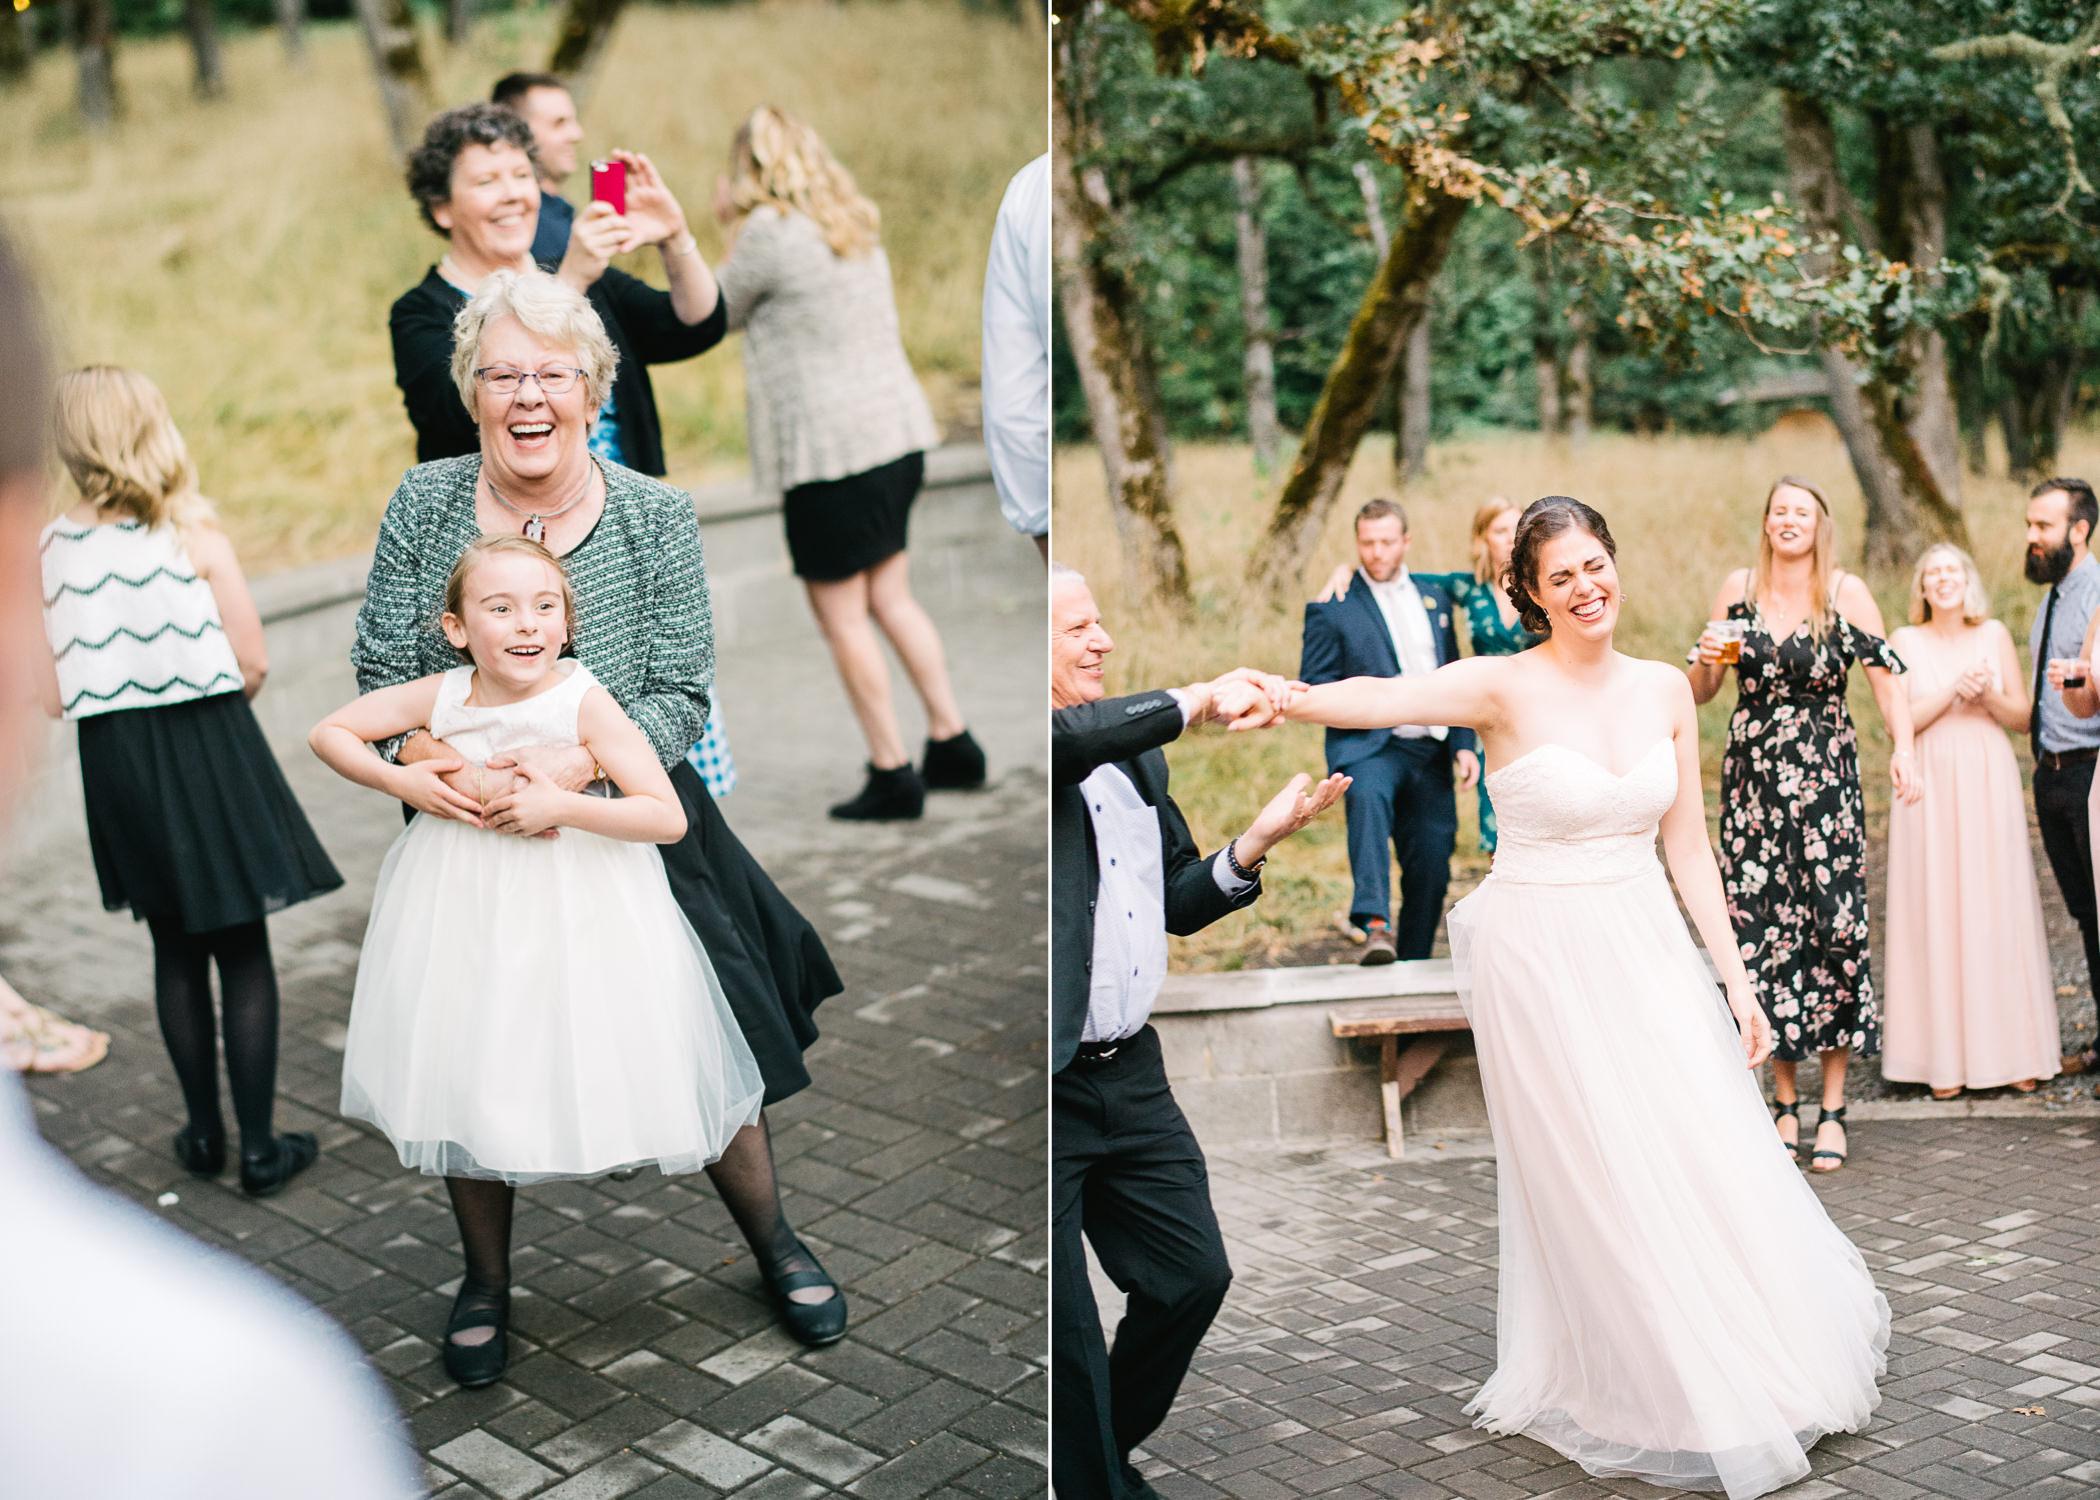 mt-pisgah-oregon-september-wedding-121a.jpg